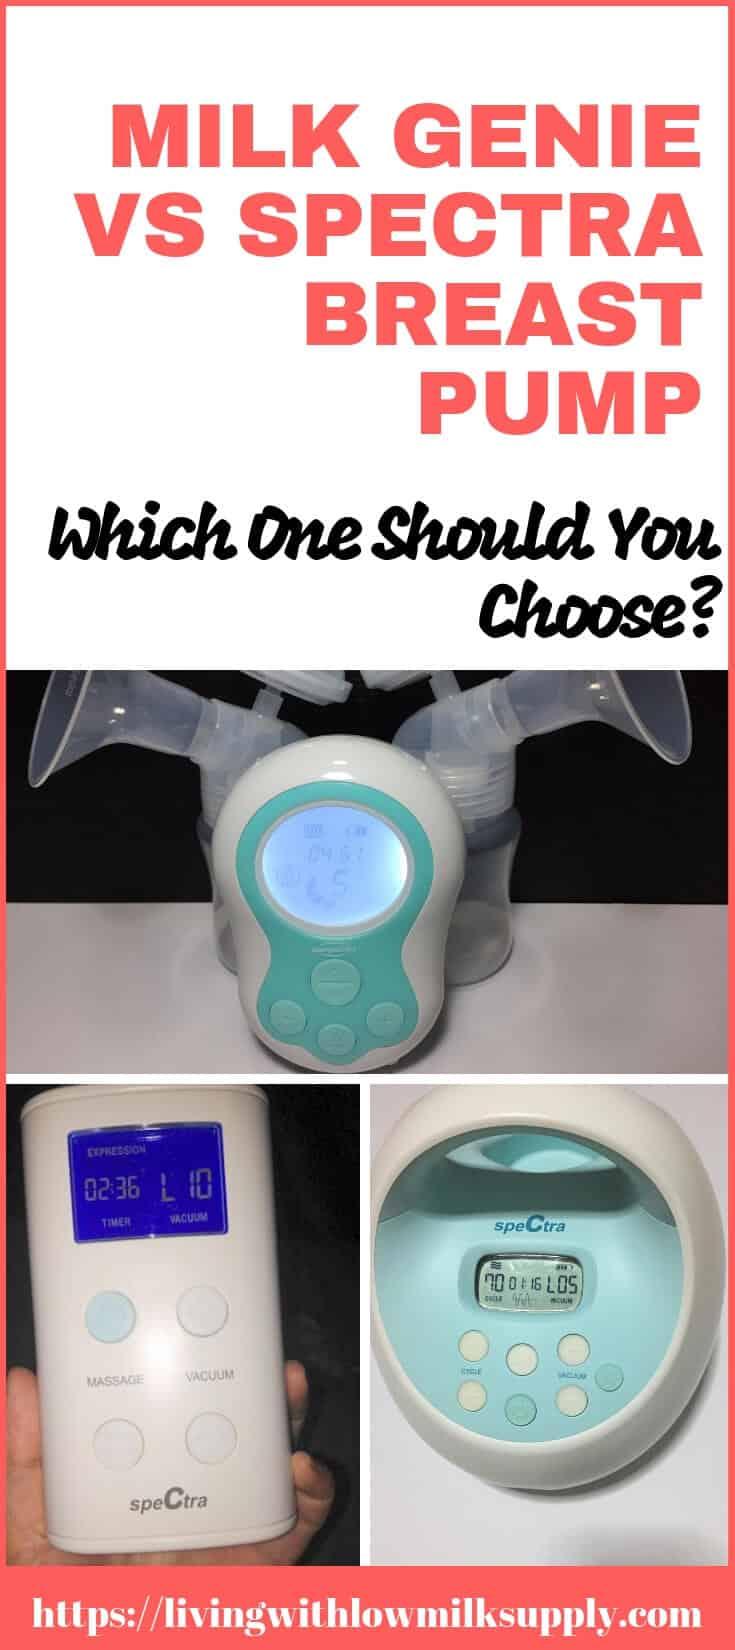 pumpables milk genie vs spectra 9+ and s1 breast pump